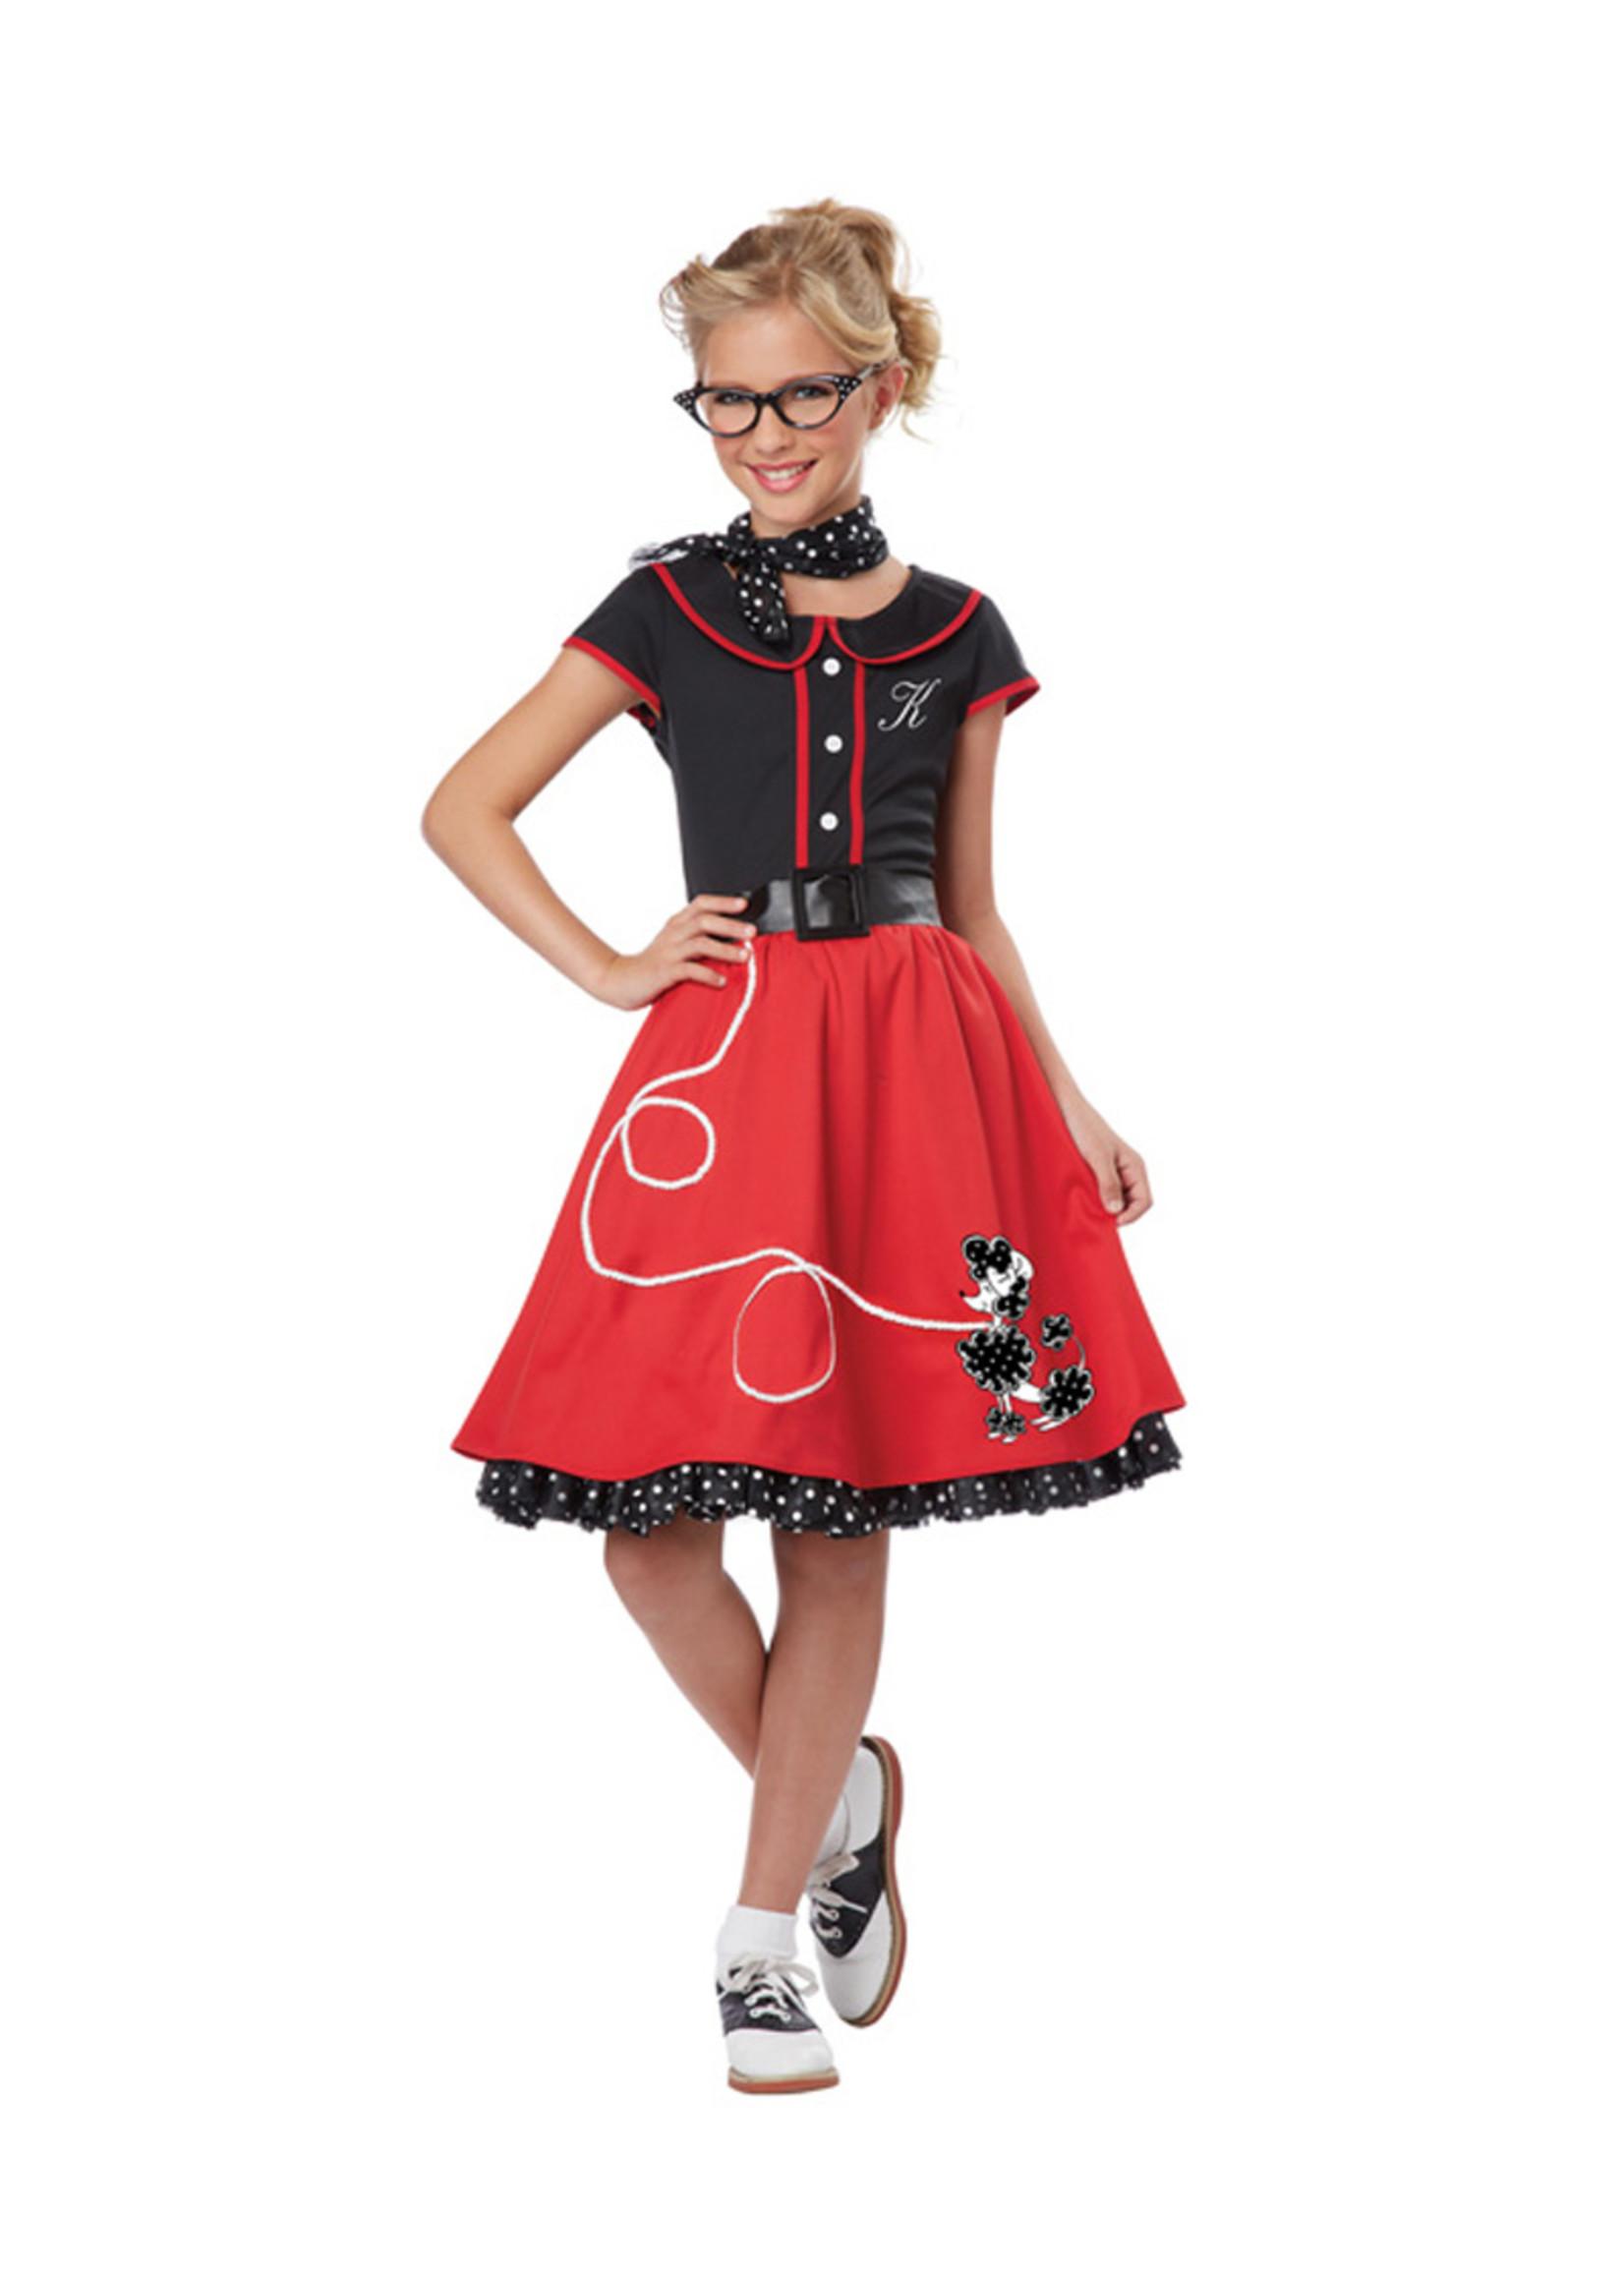 50's Sweetheart Red Costume - Girls